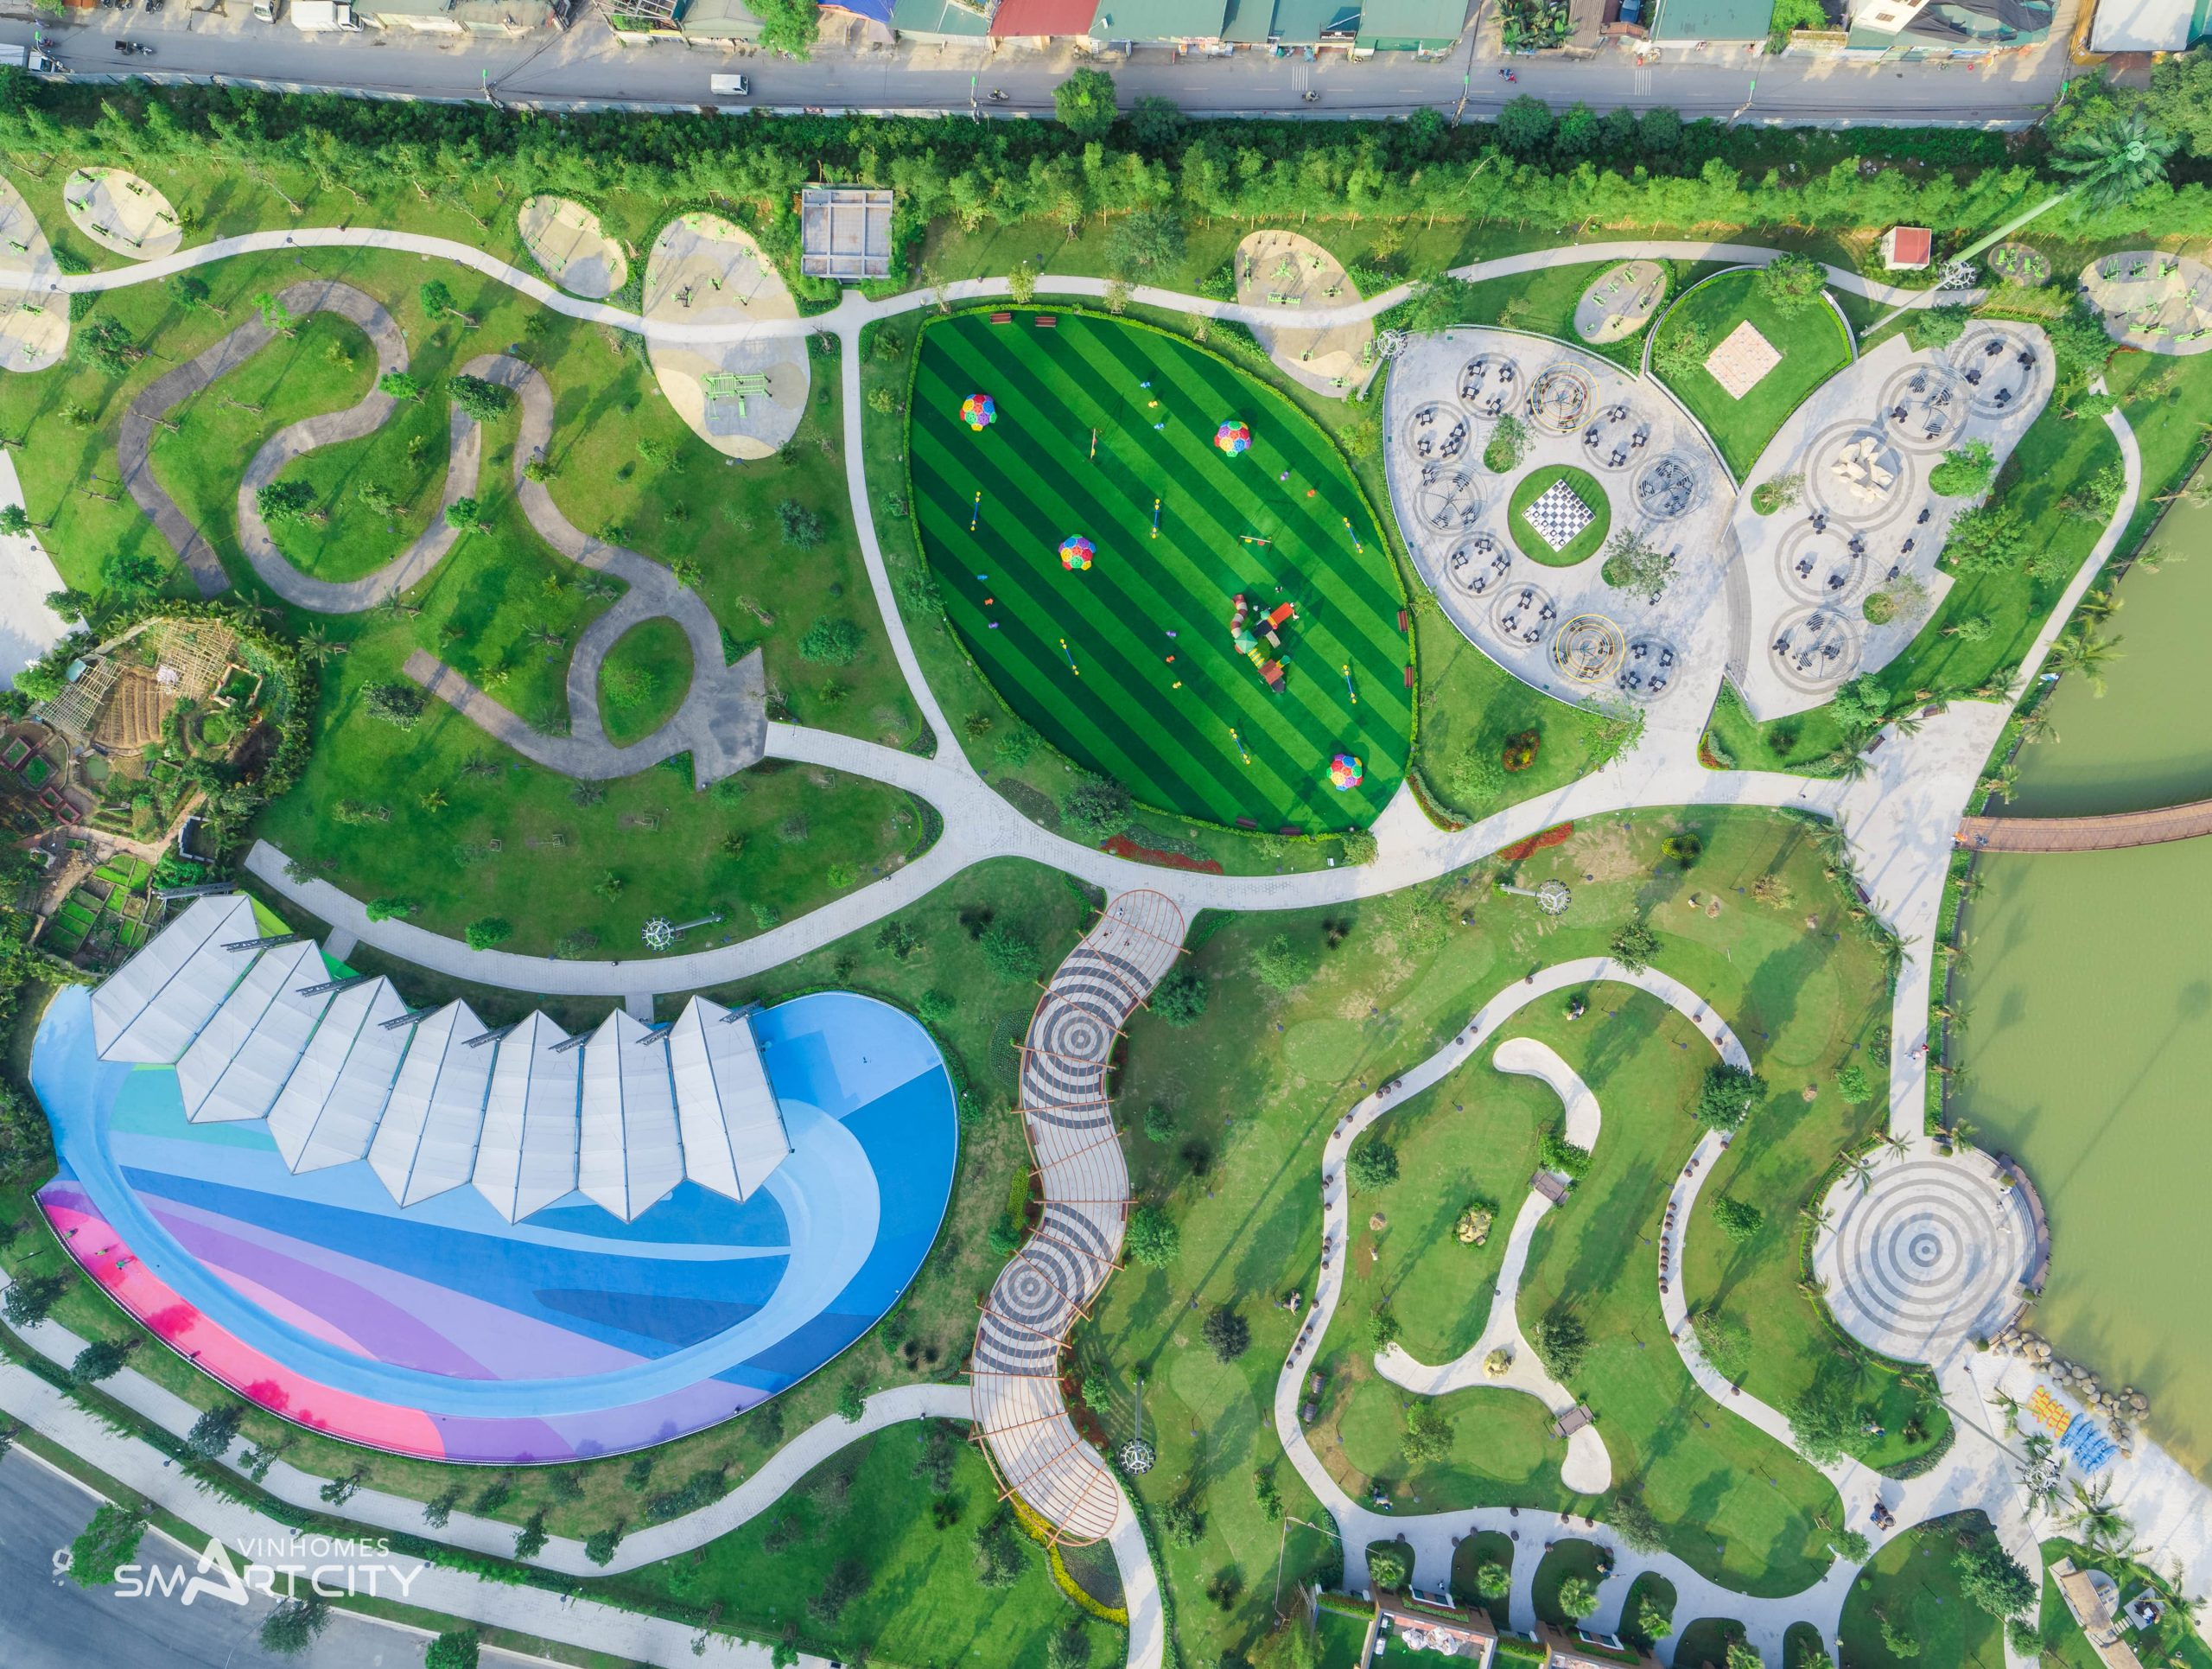 cong-vien-trung-tam-vinhomes-smart-city